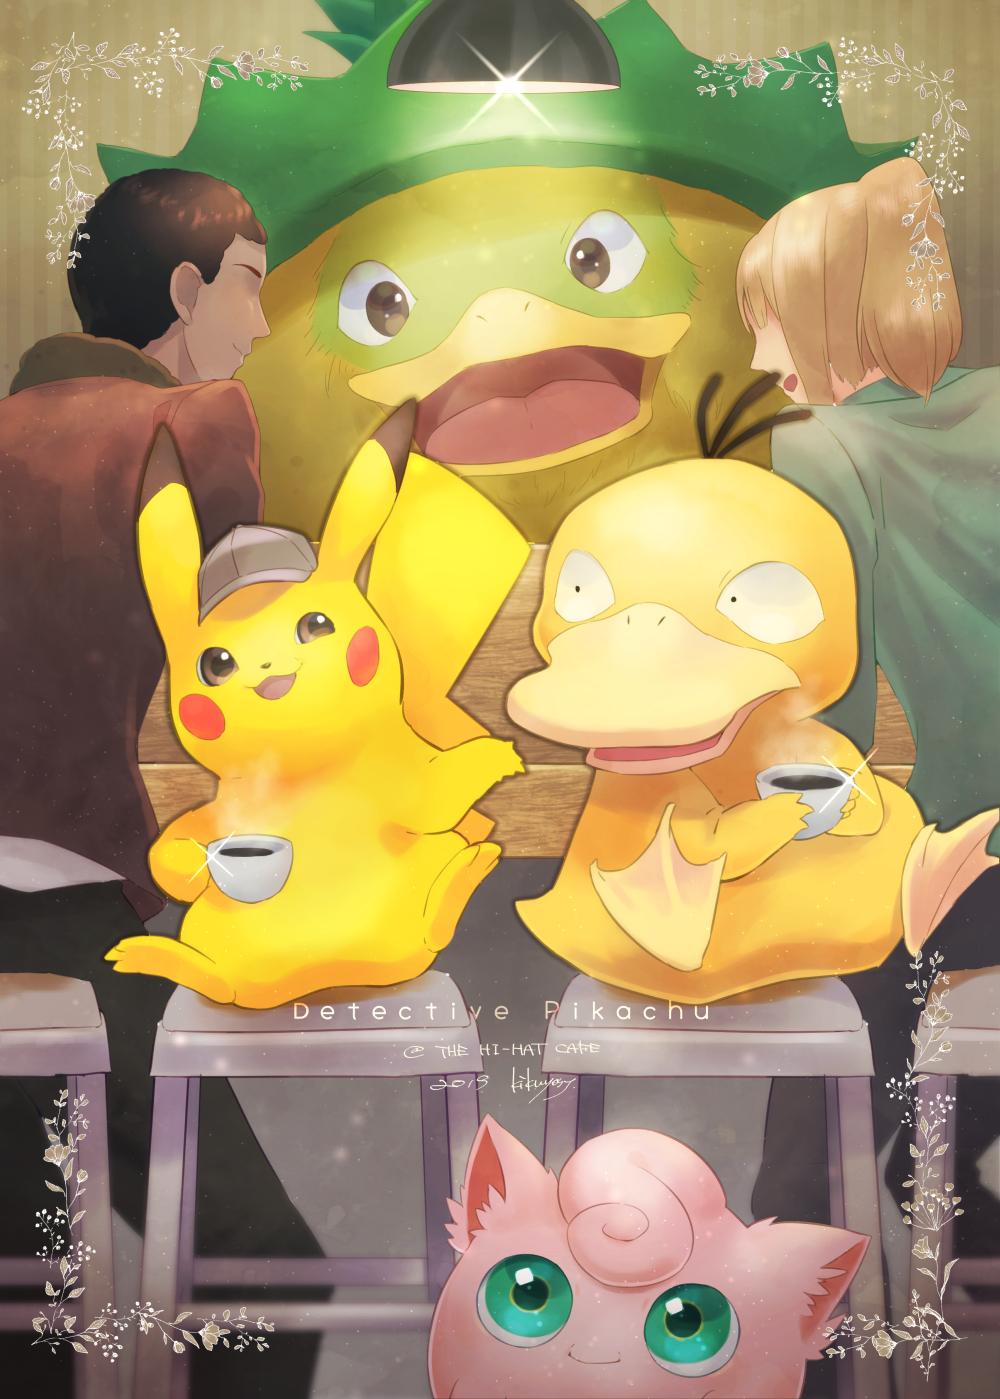 Detective Pikachu Pokemon Image 2662190 Zerochan Anime